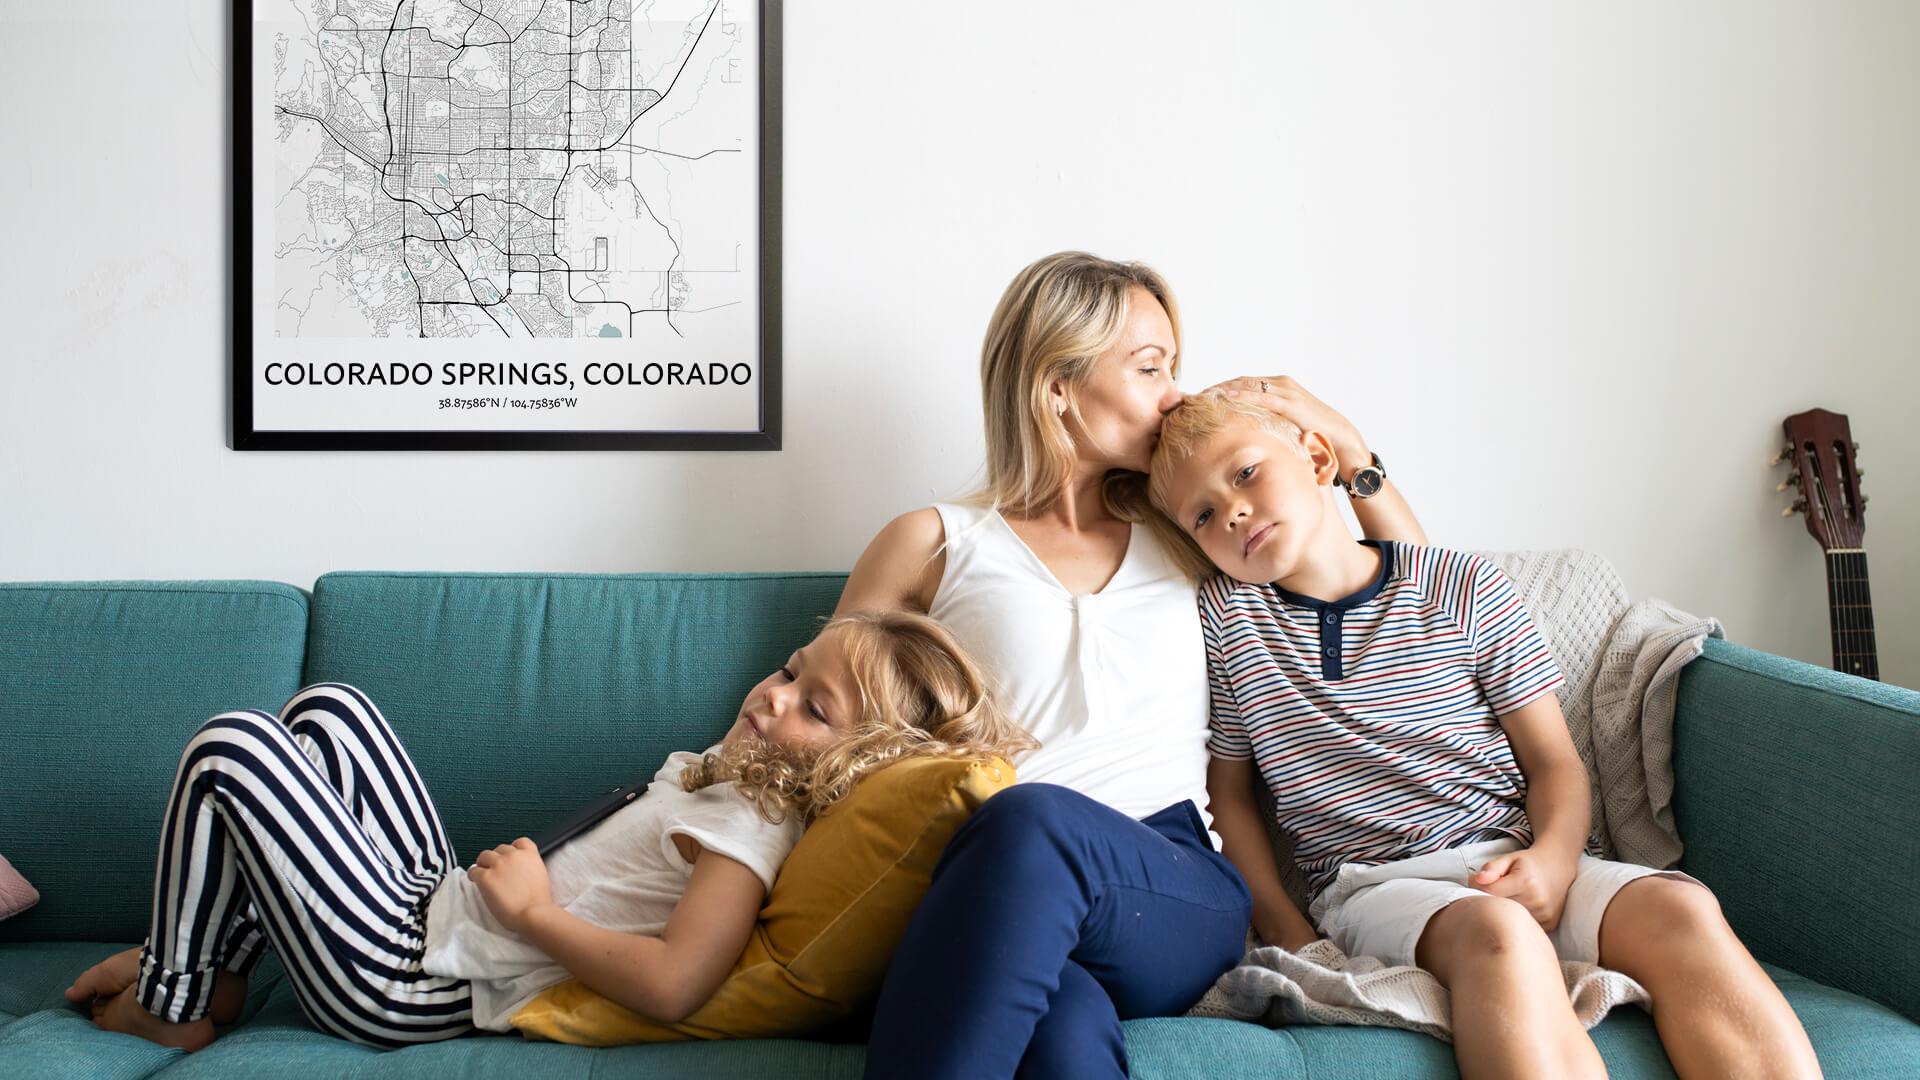 Colorado Springs map poster